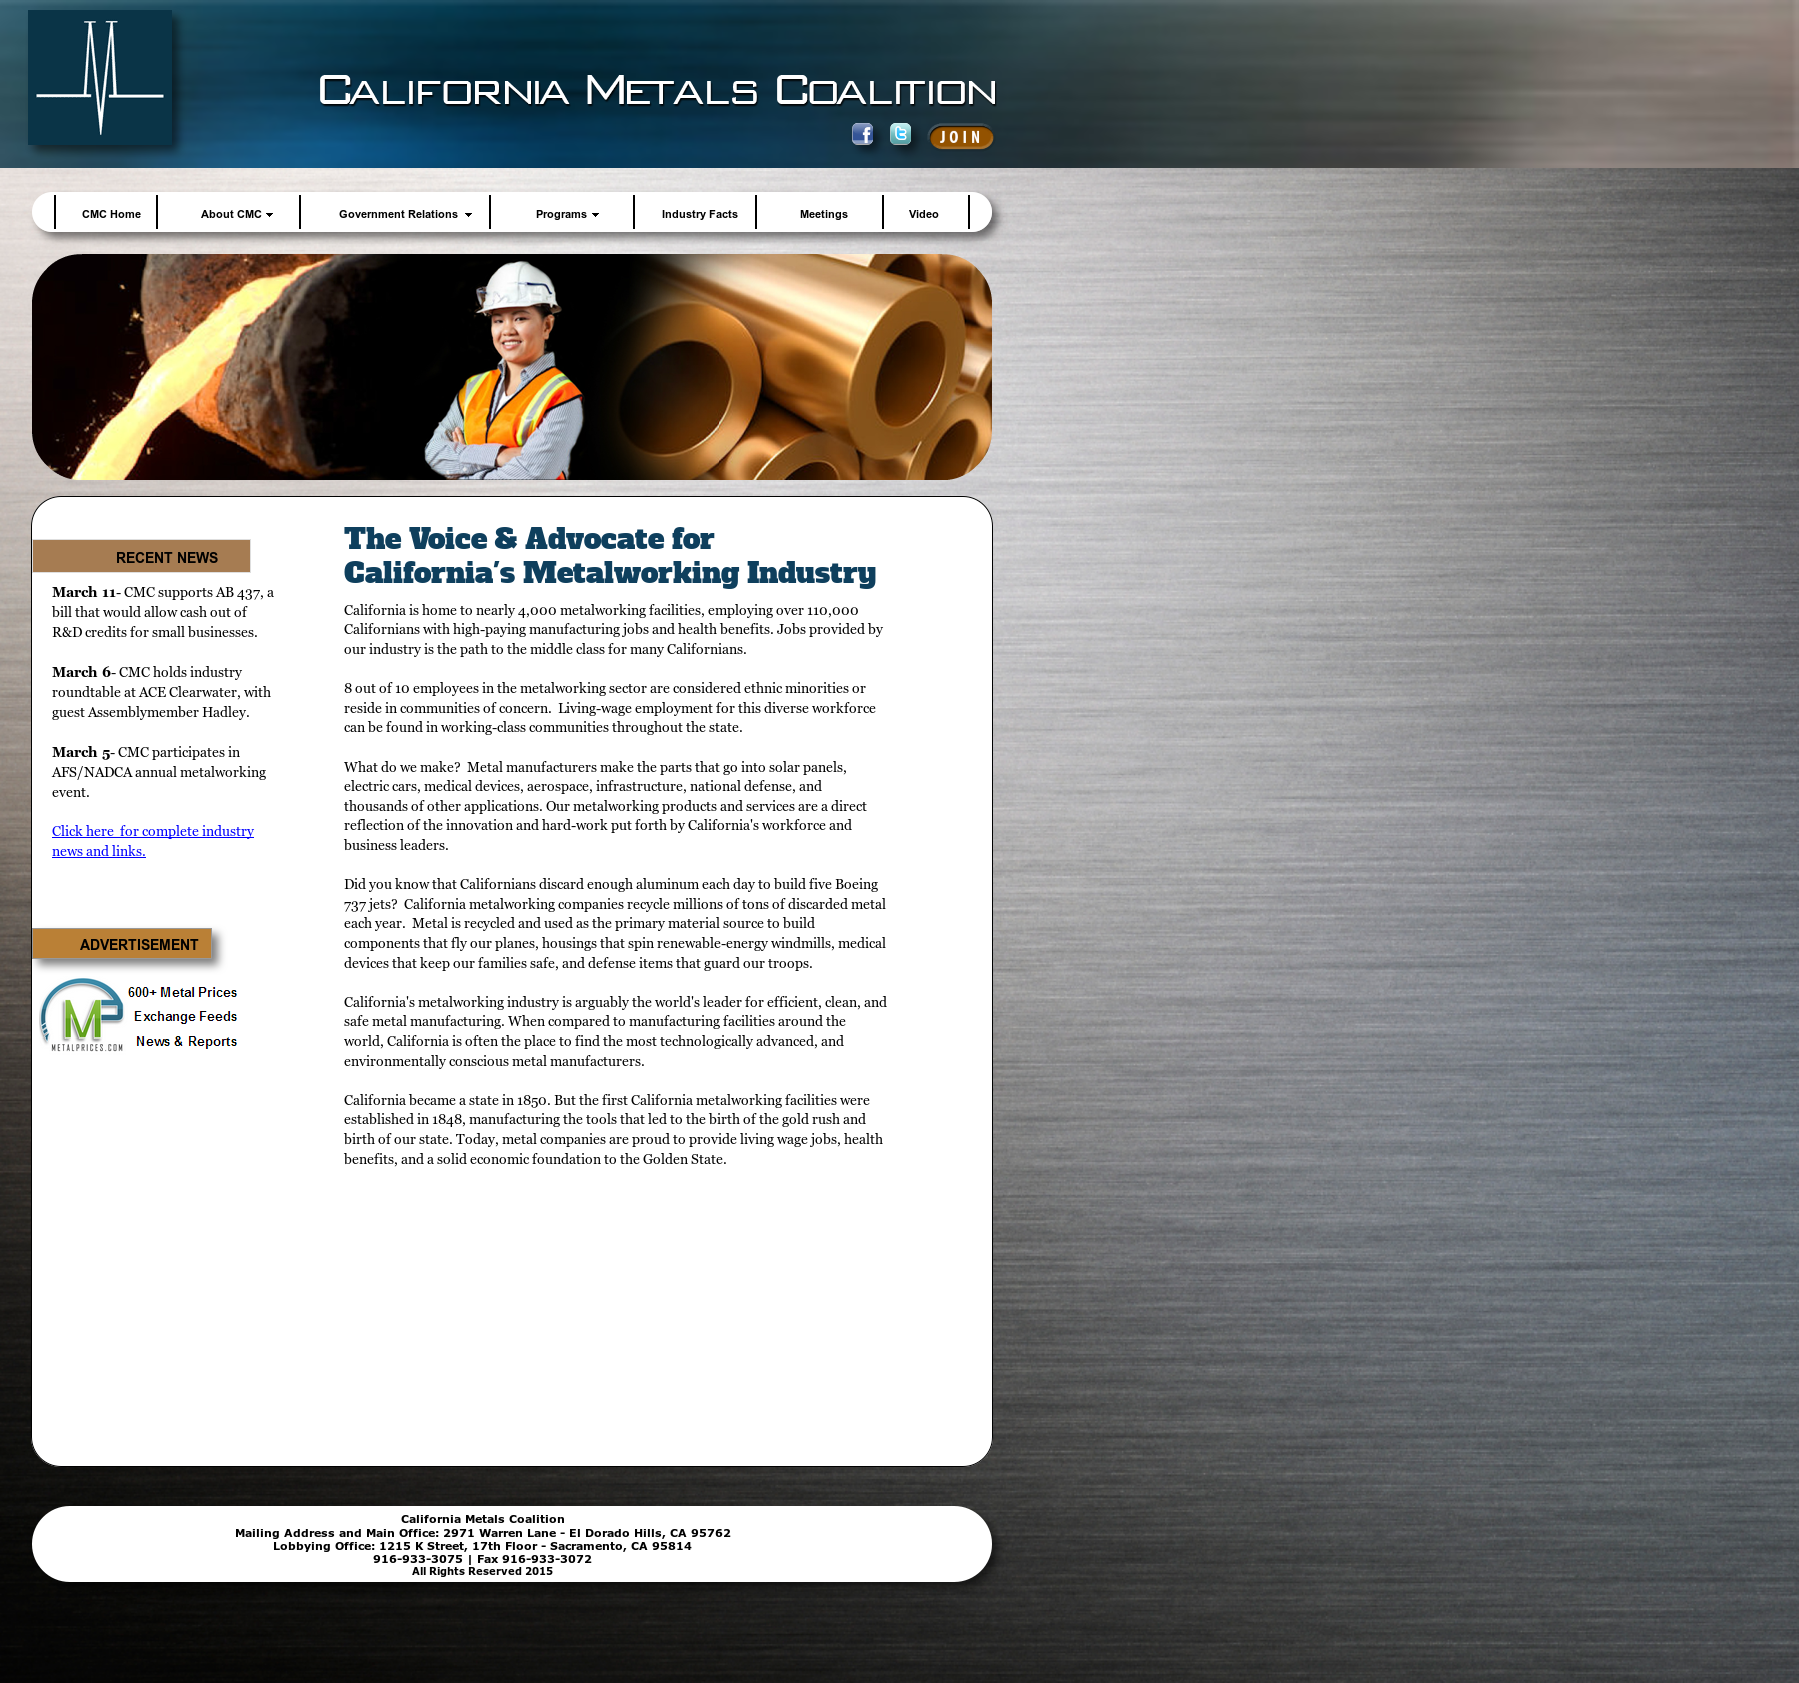 California Metals Coalition Competitors, Revenue and